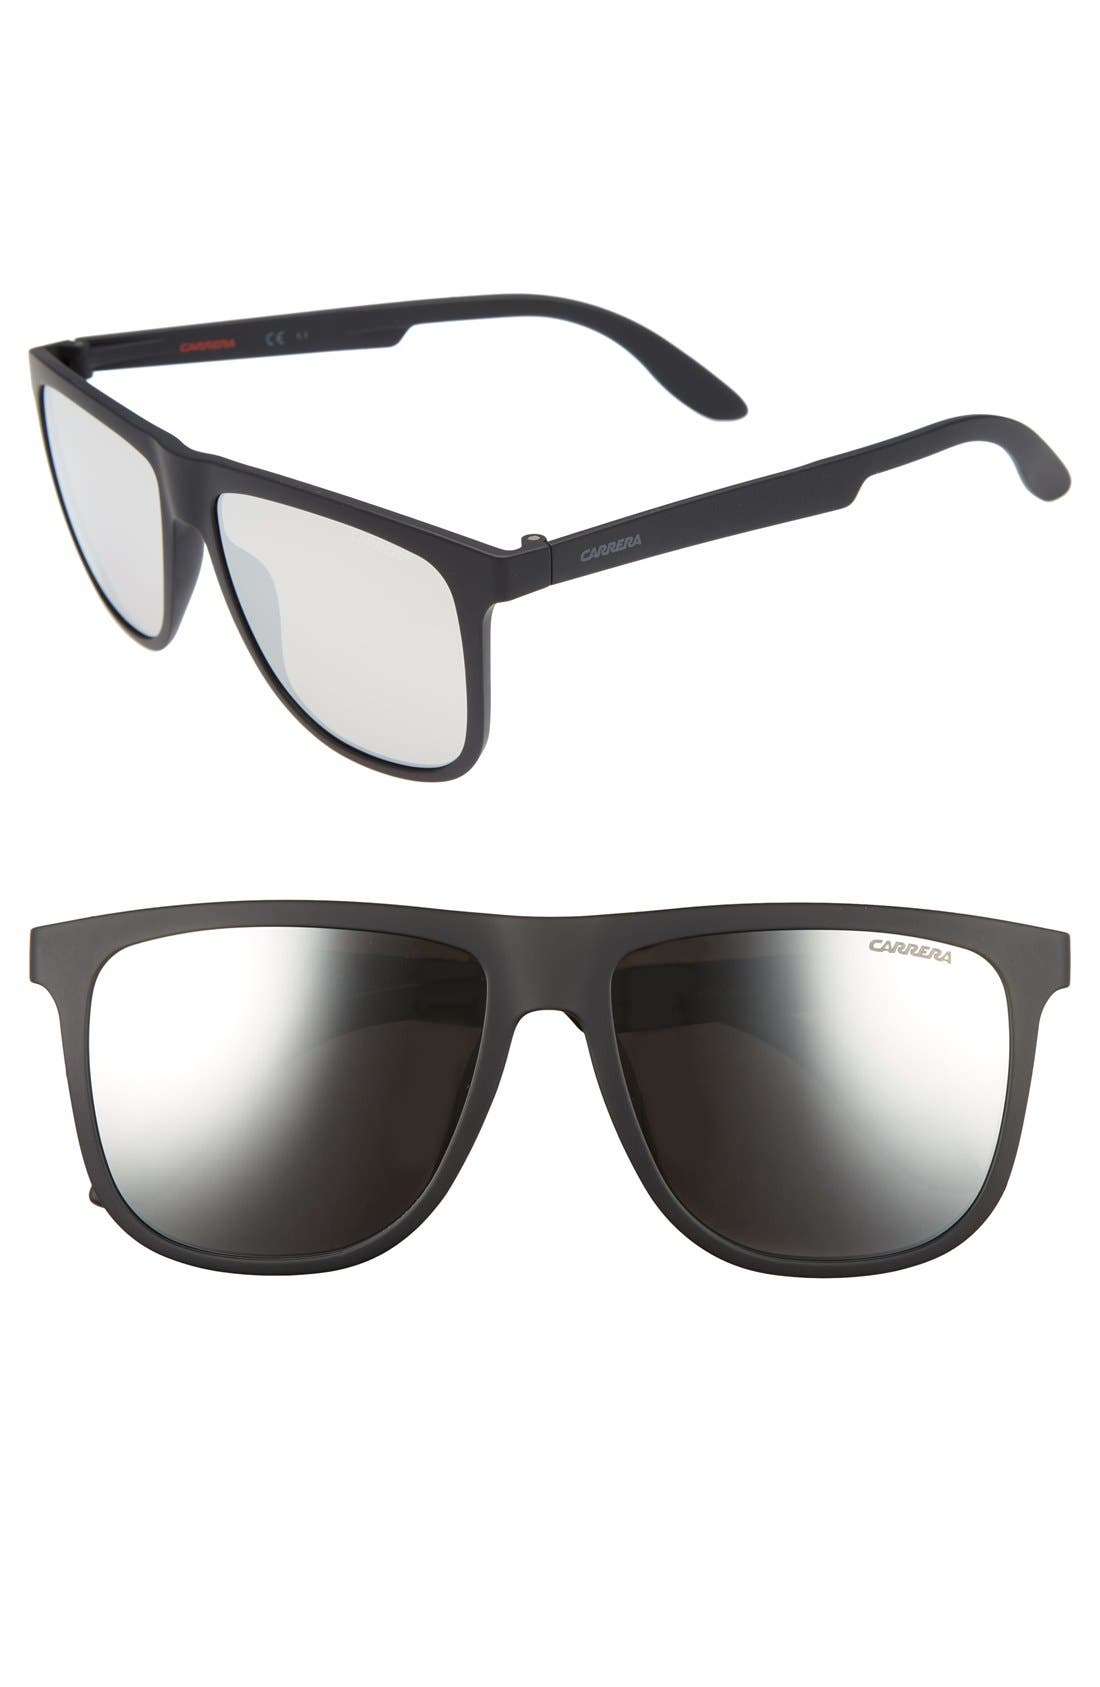 5003ST 57mm Sunglasses,                             Alternate thumbnail 2, color,                             001